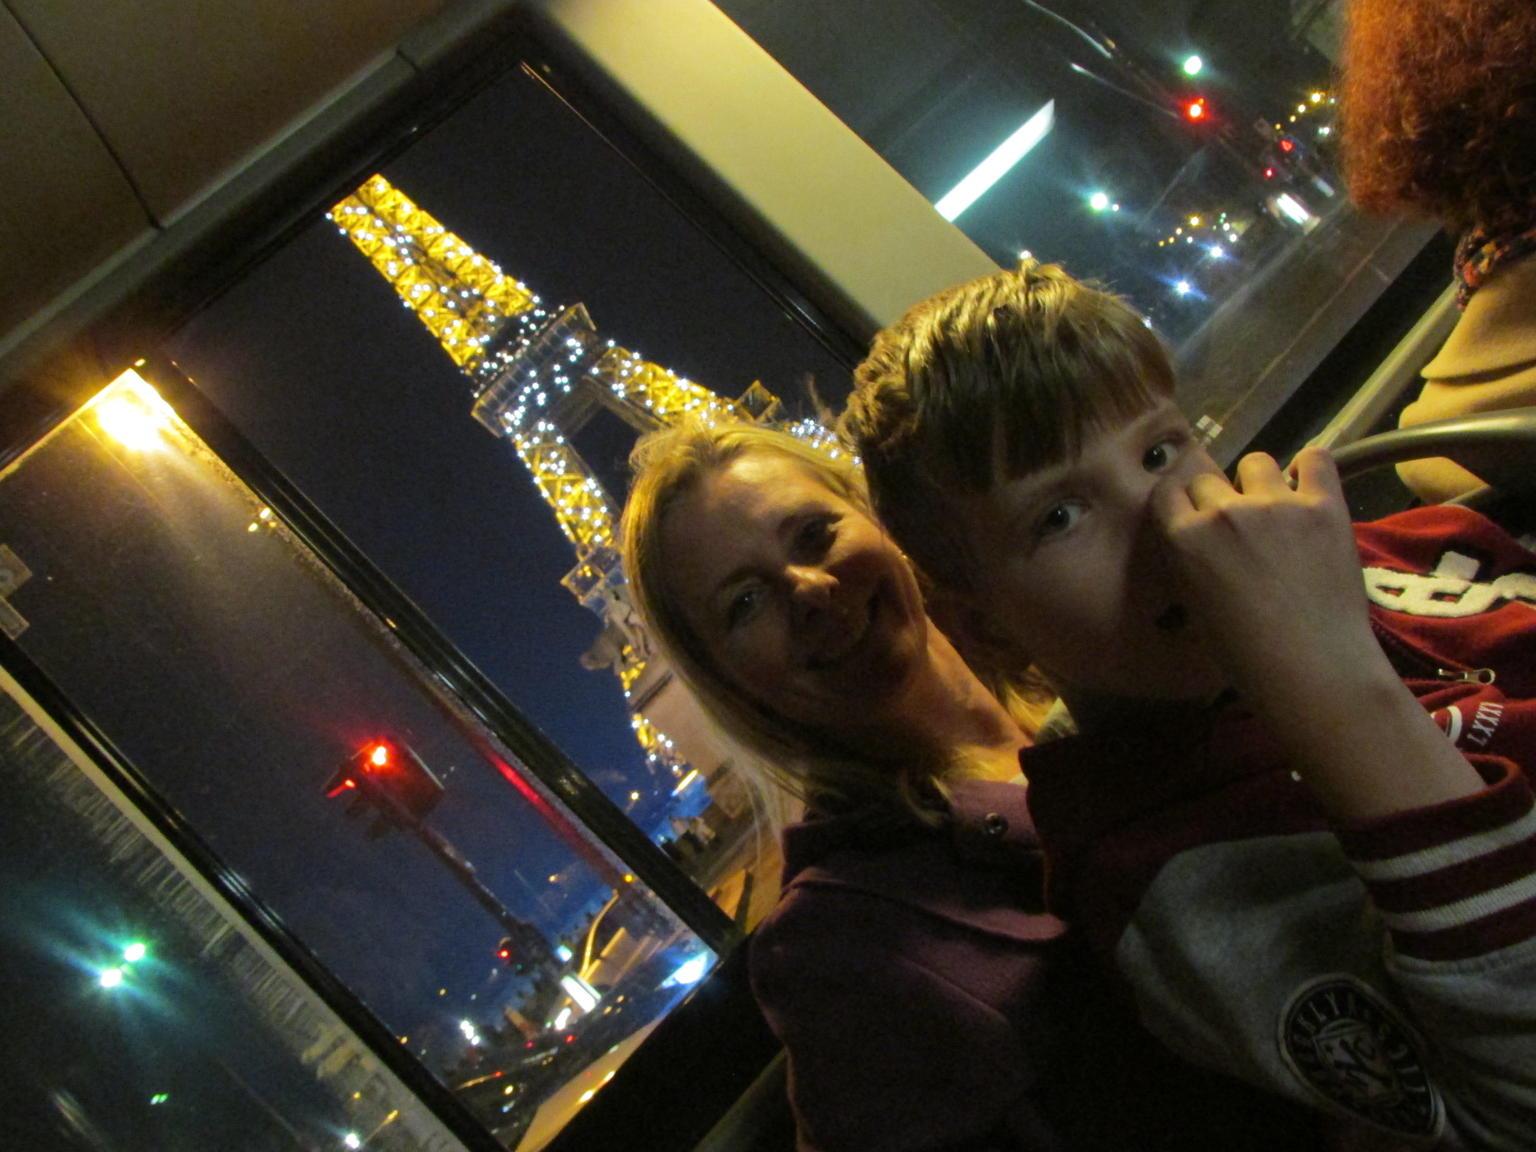 MORE PHOTOS, Big Bus Paris Night Tour